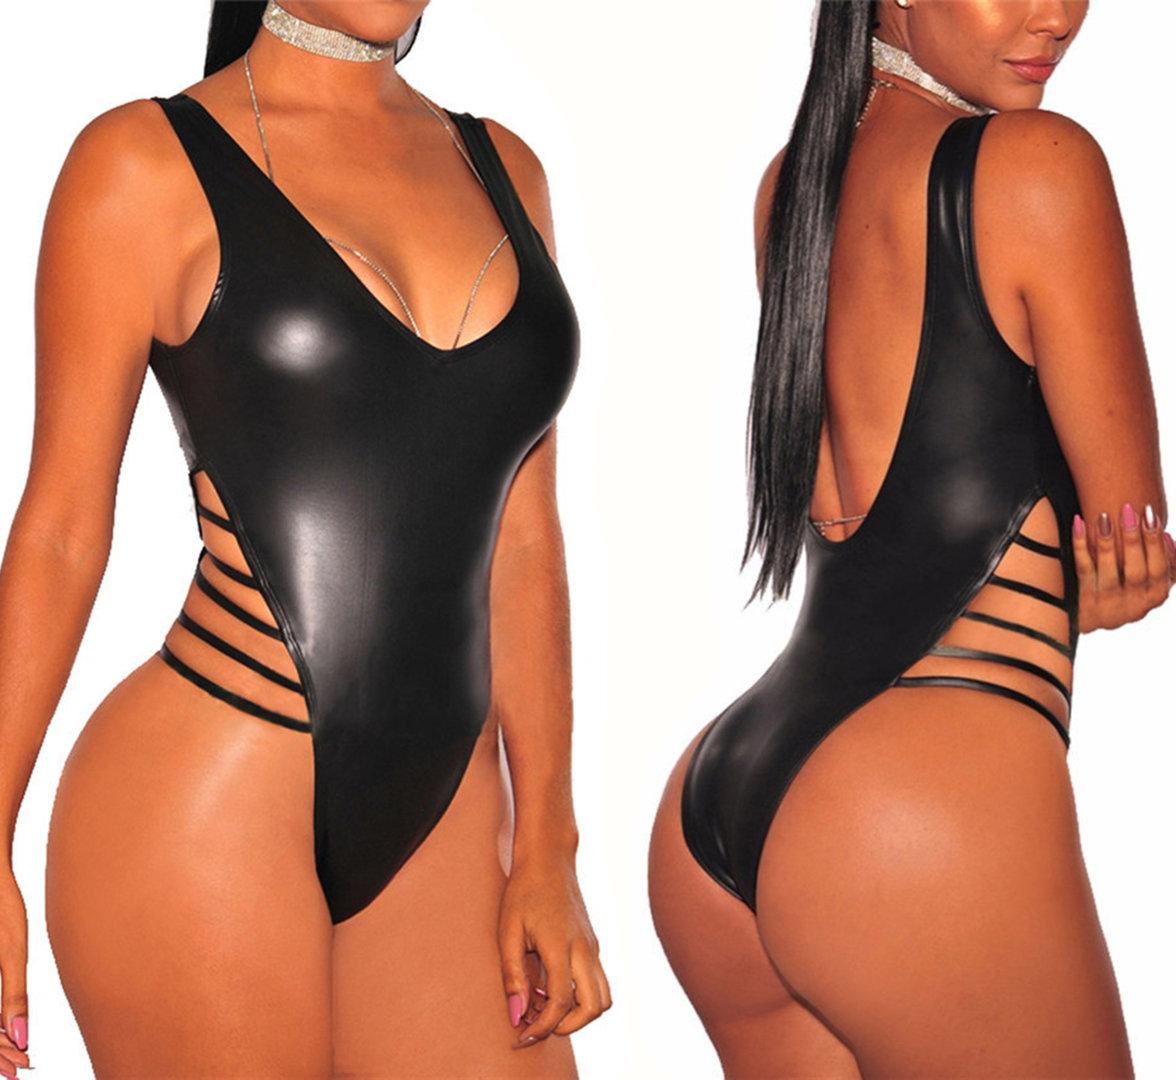 Hot Sexy Body In Black Lycra Brilliant - Dream-Luxury-6642